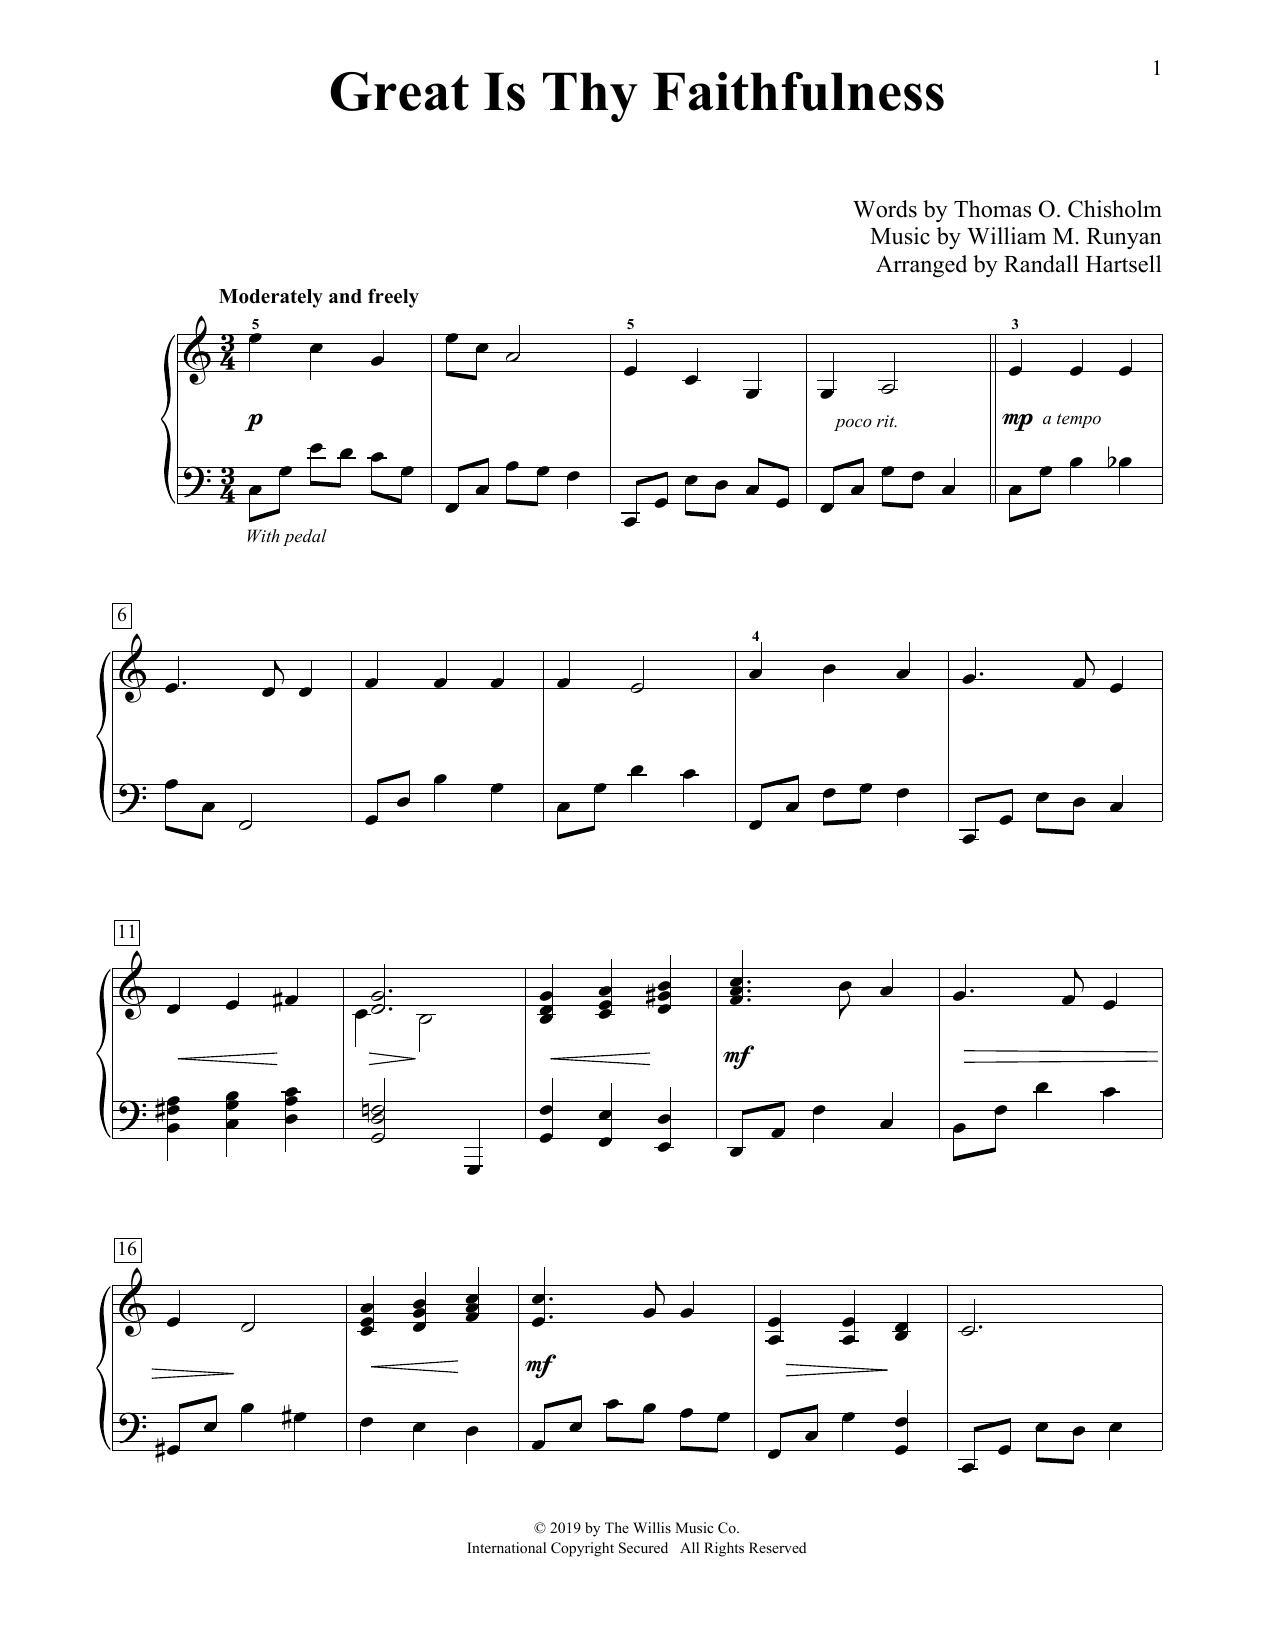 Great Is Thy Faithfulness (arr. Randall Hartsell) (Educational Piano)